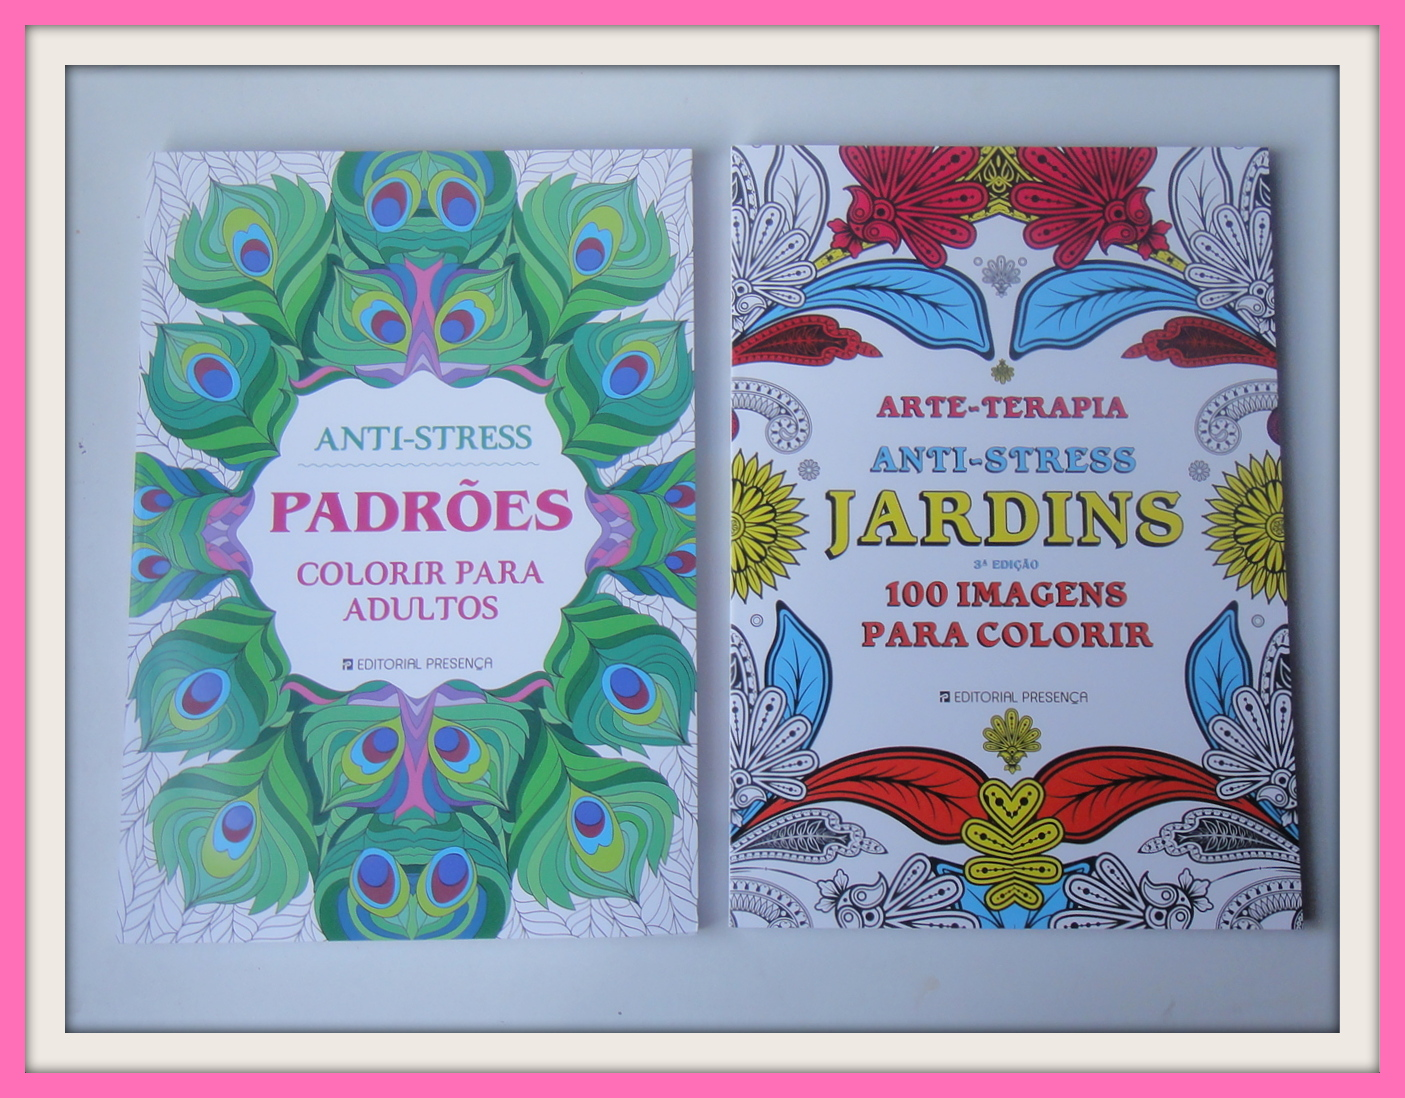 Arte Terapia Antistress Jardins  100 Imagens para Colorir  981€